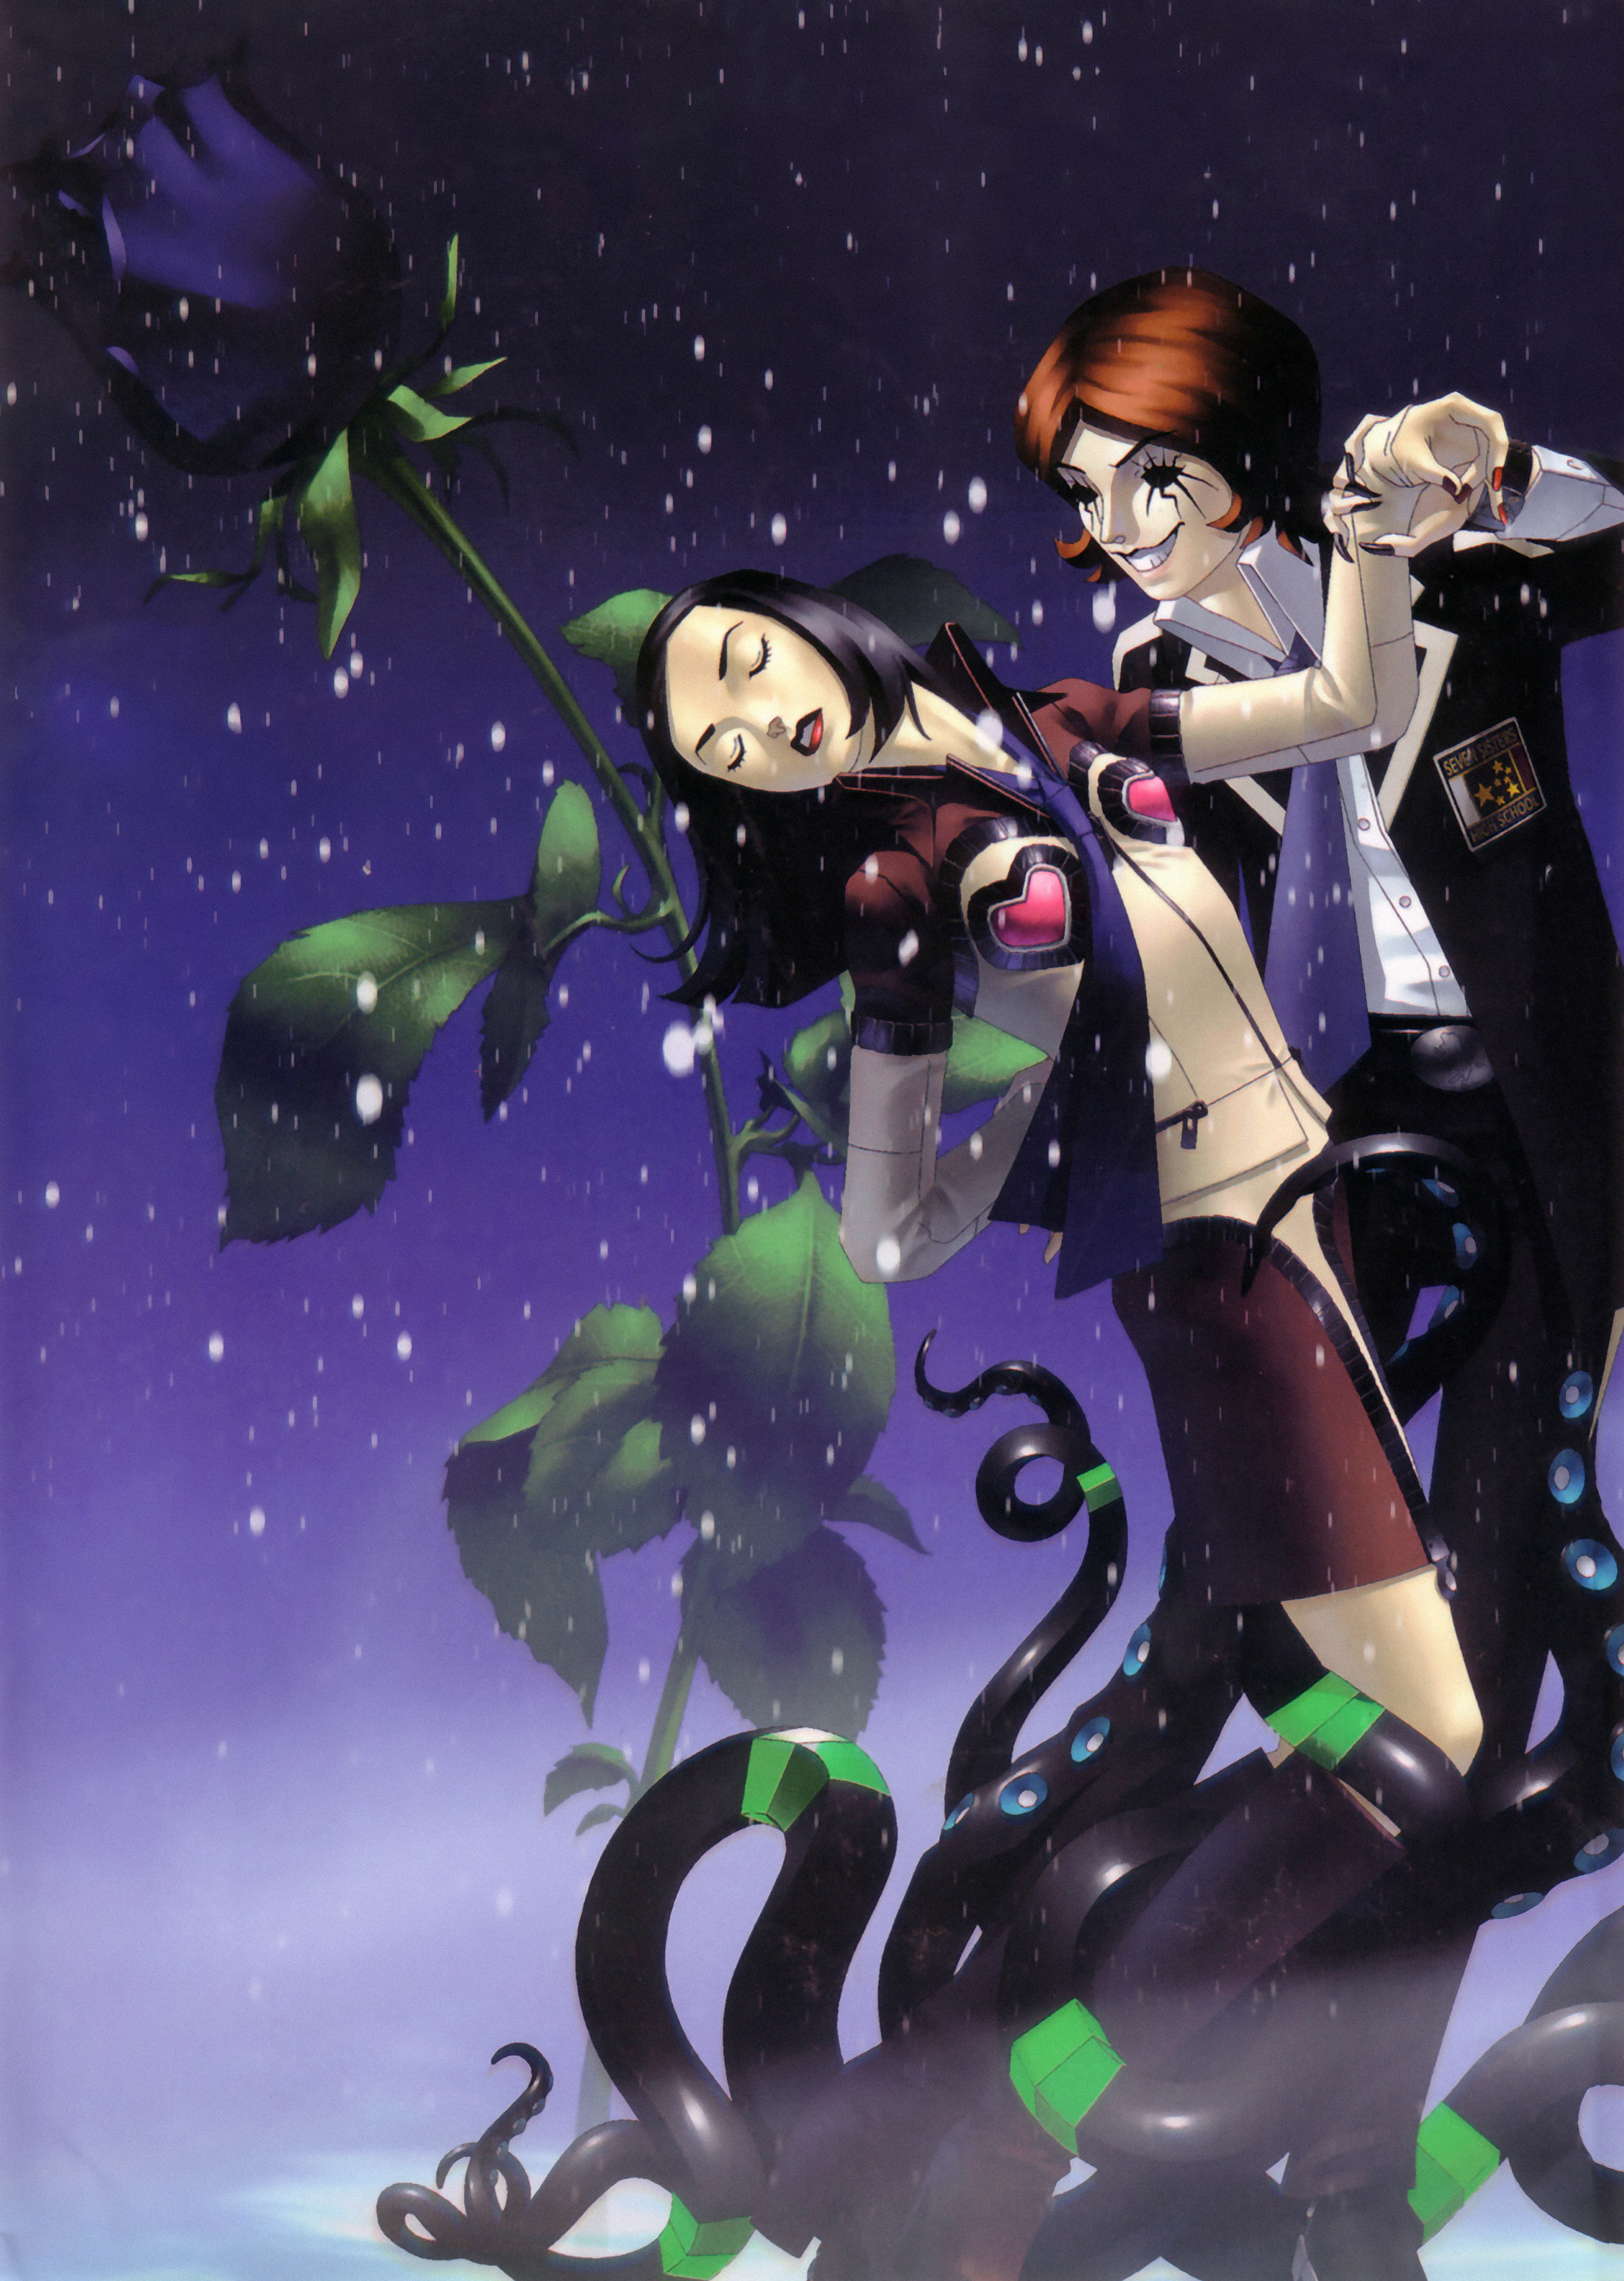 Persona 2 Eternal Punishment Clean Kaneko Art by marblegallery7